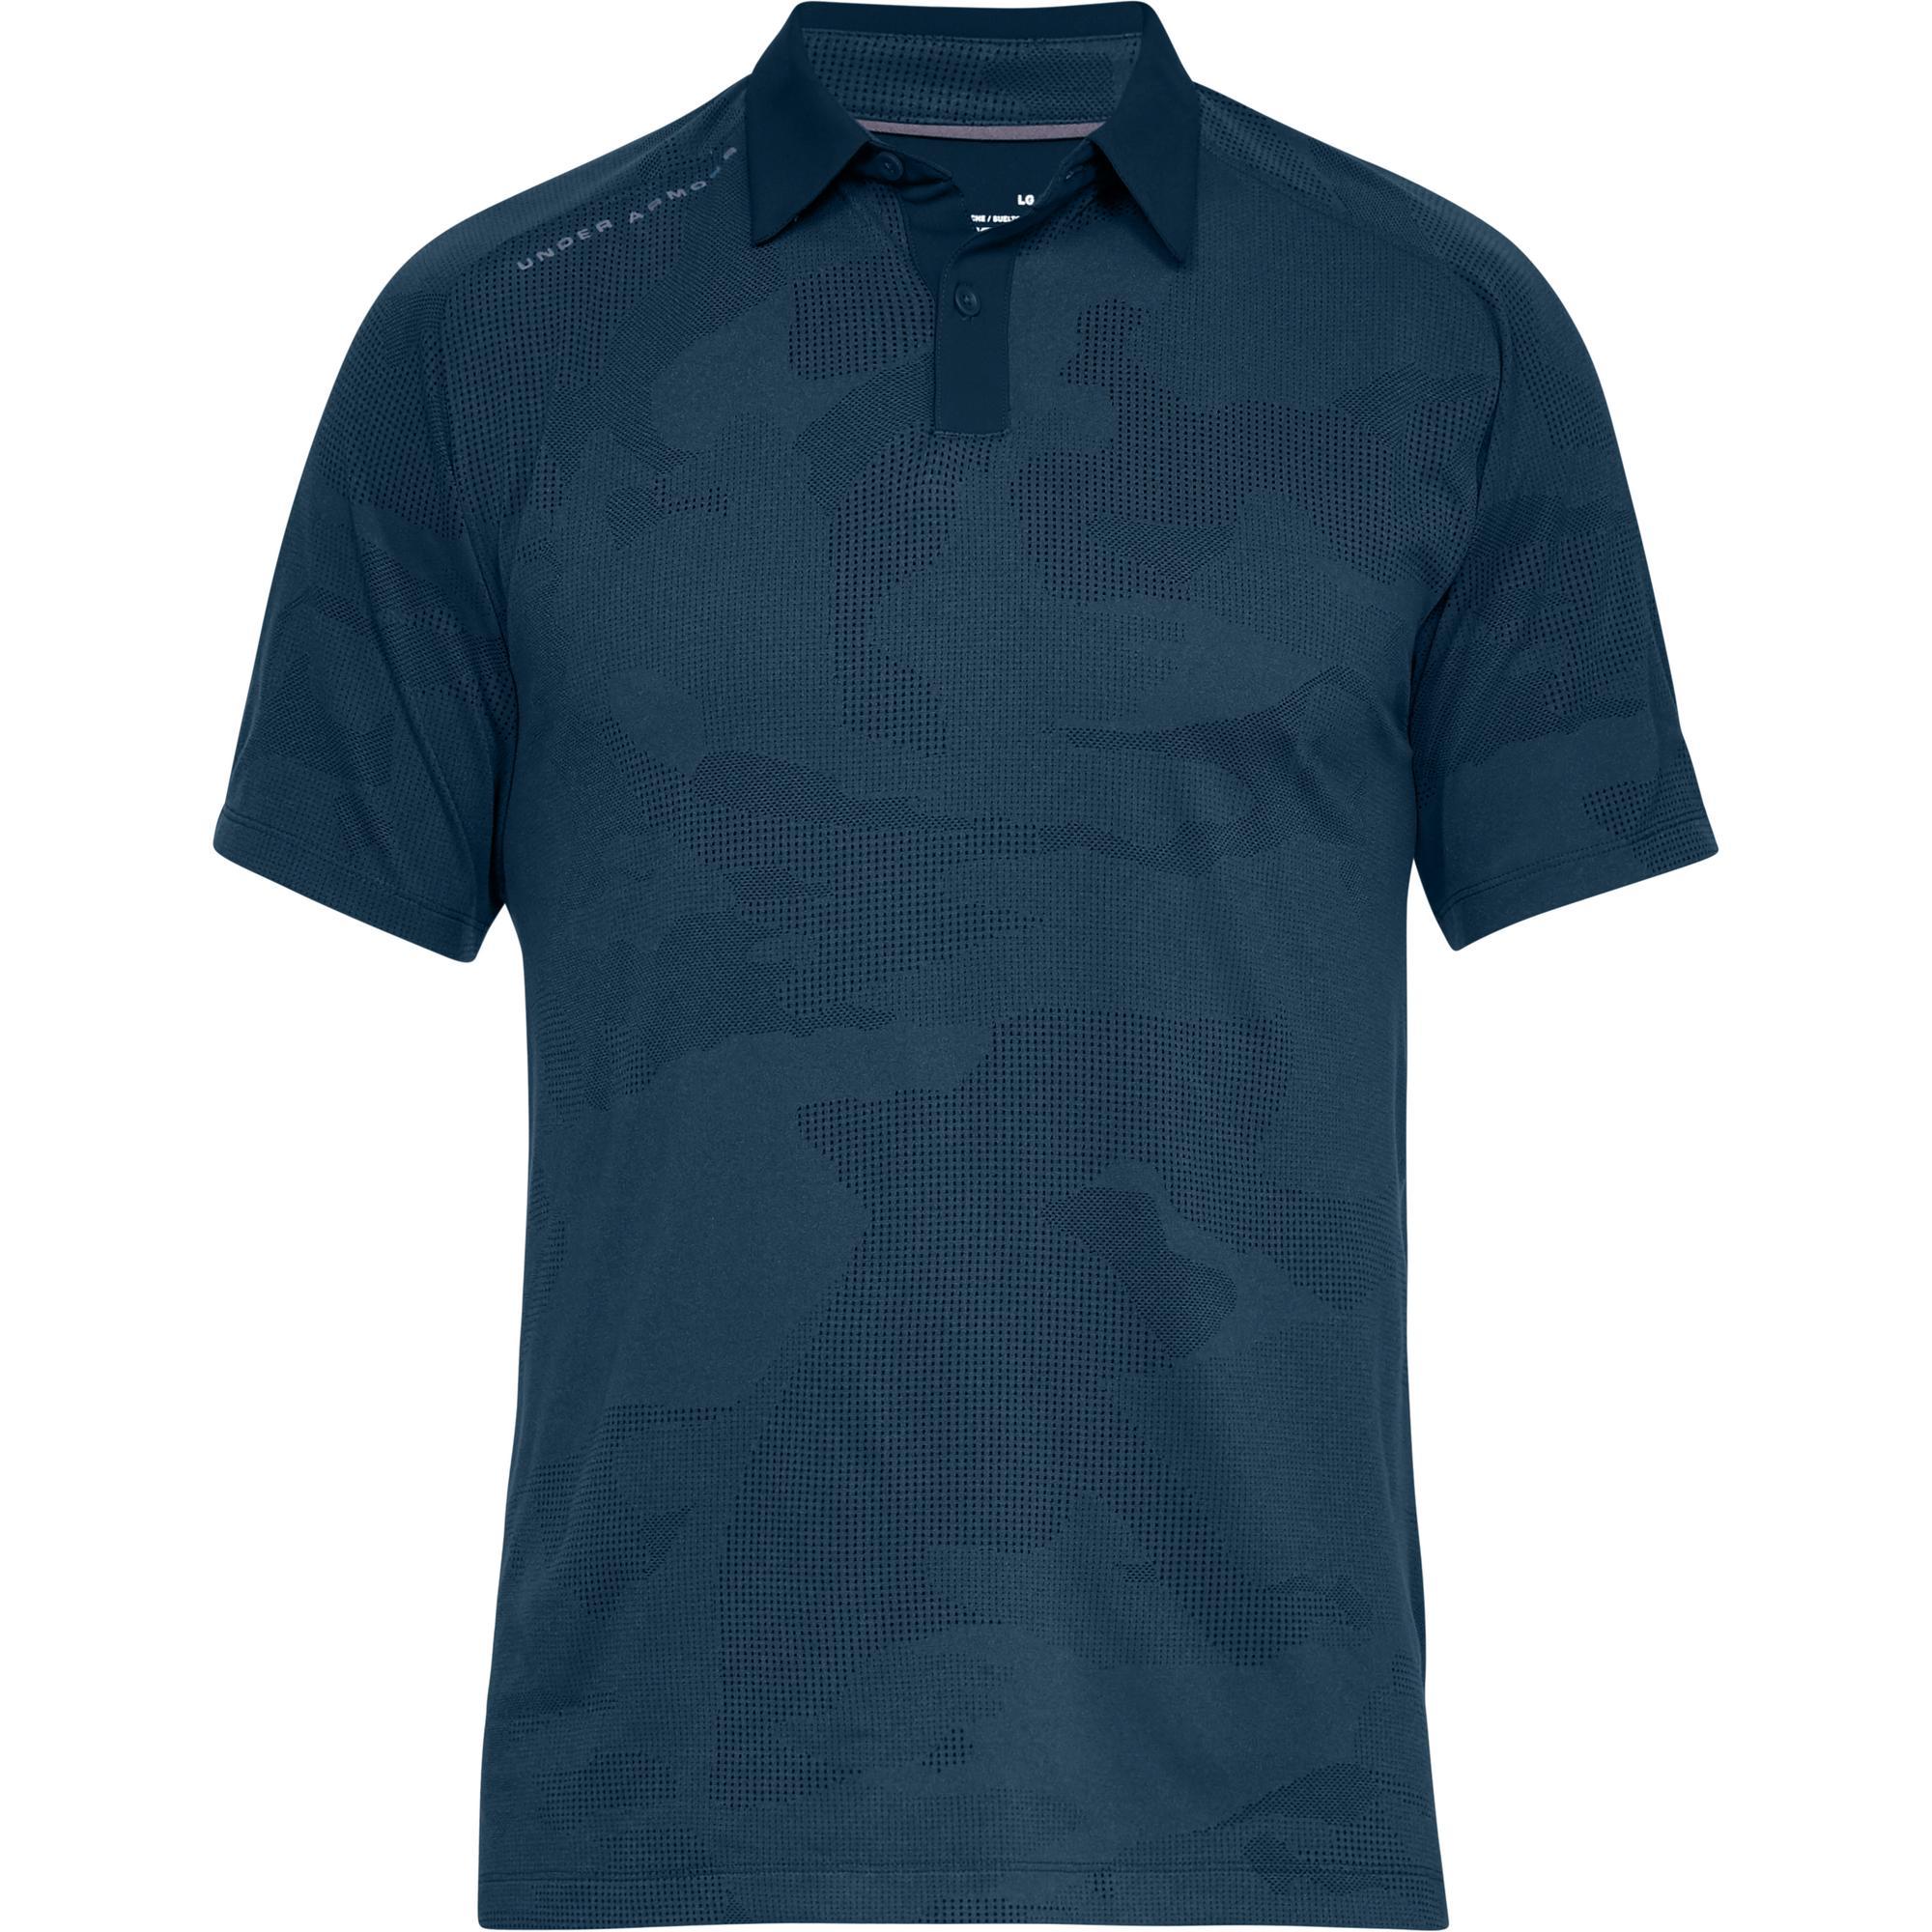 Men's Vanish Sprocket Short Sleeve Polo